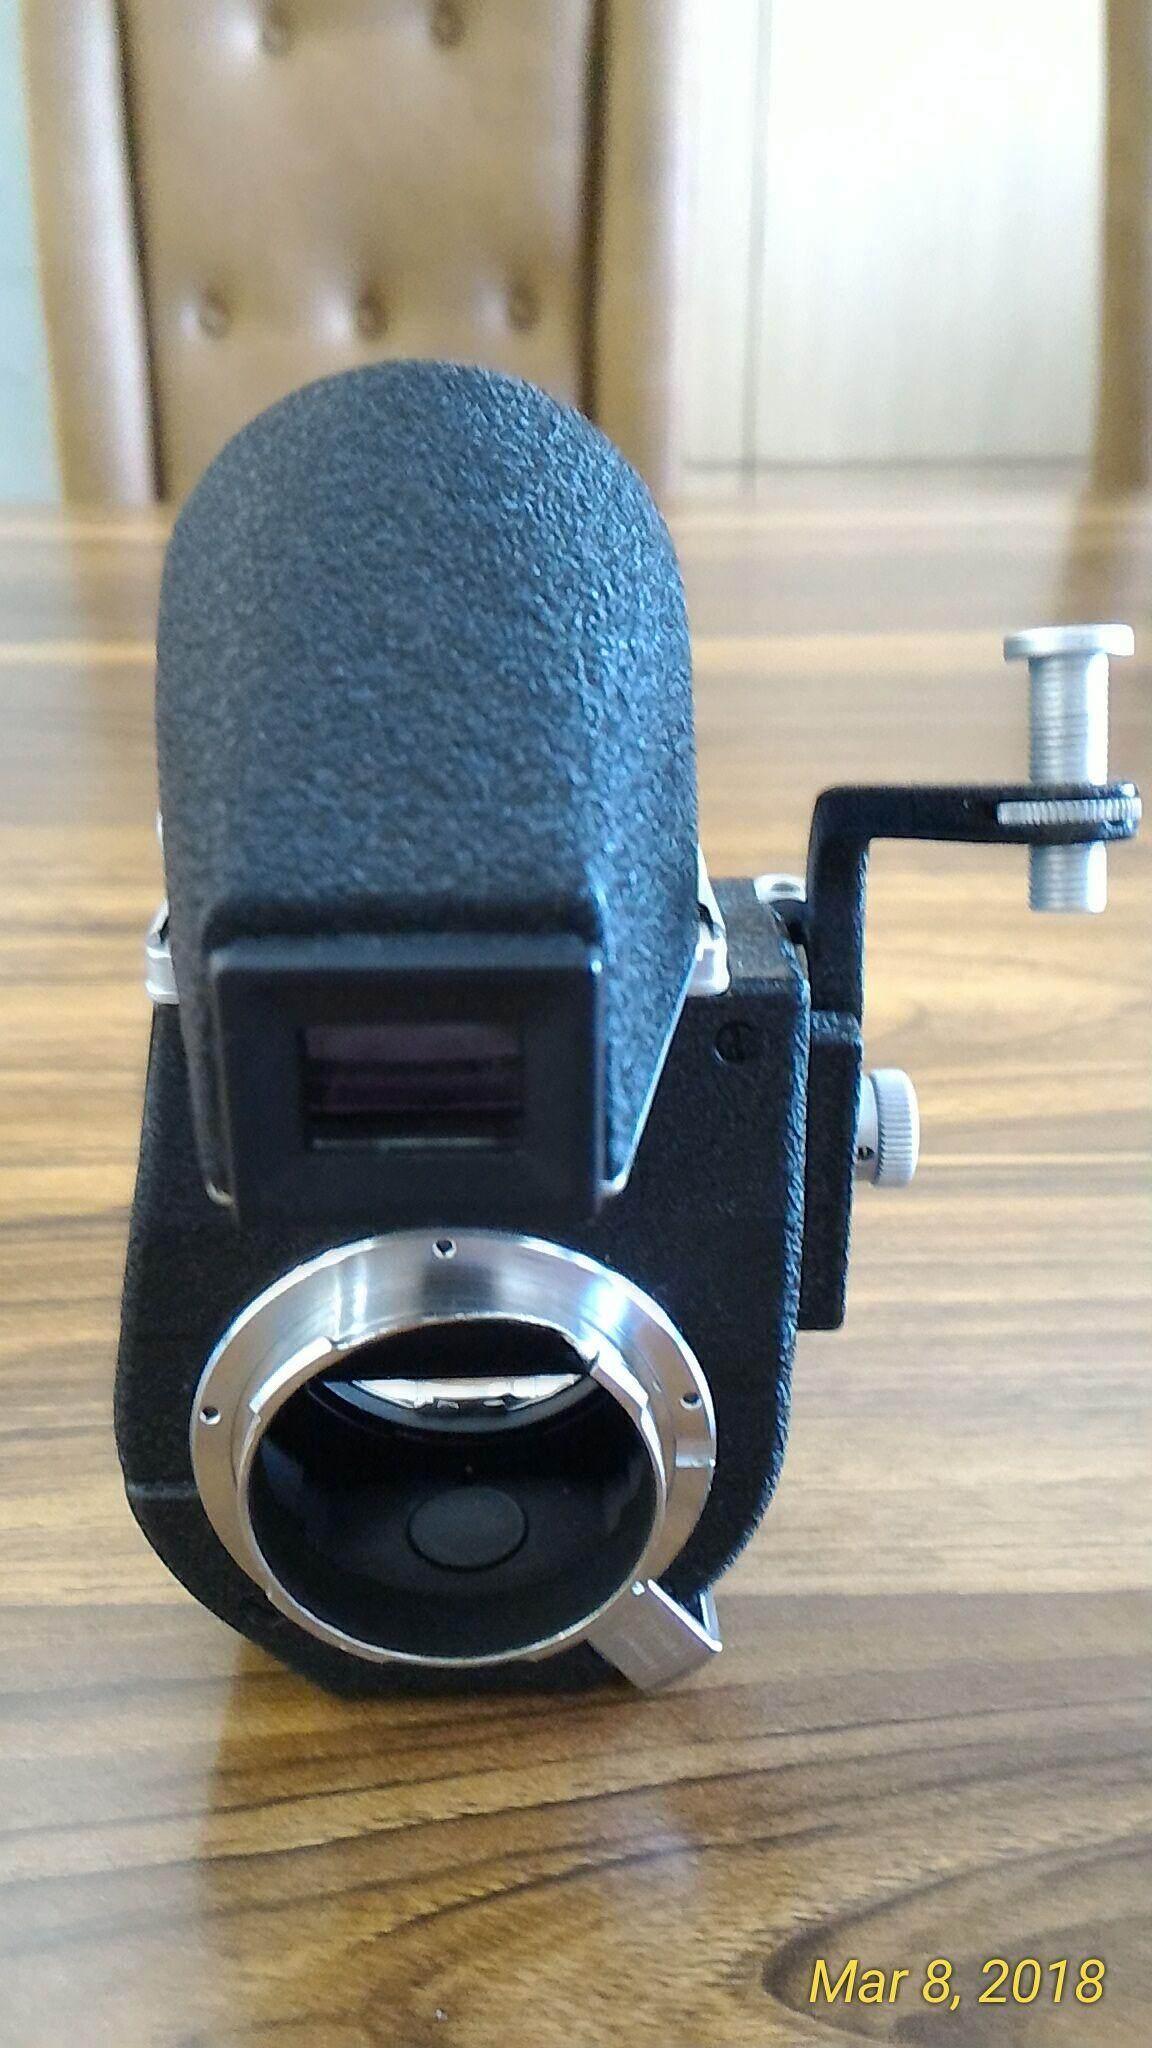 Mint Leitz Leica Visoflex Iii Reflex Housing W/4x Magnifier & Box For M2 M3 M4.. By Petiteit.